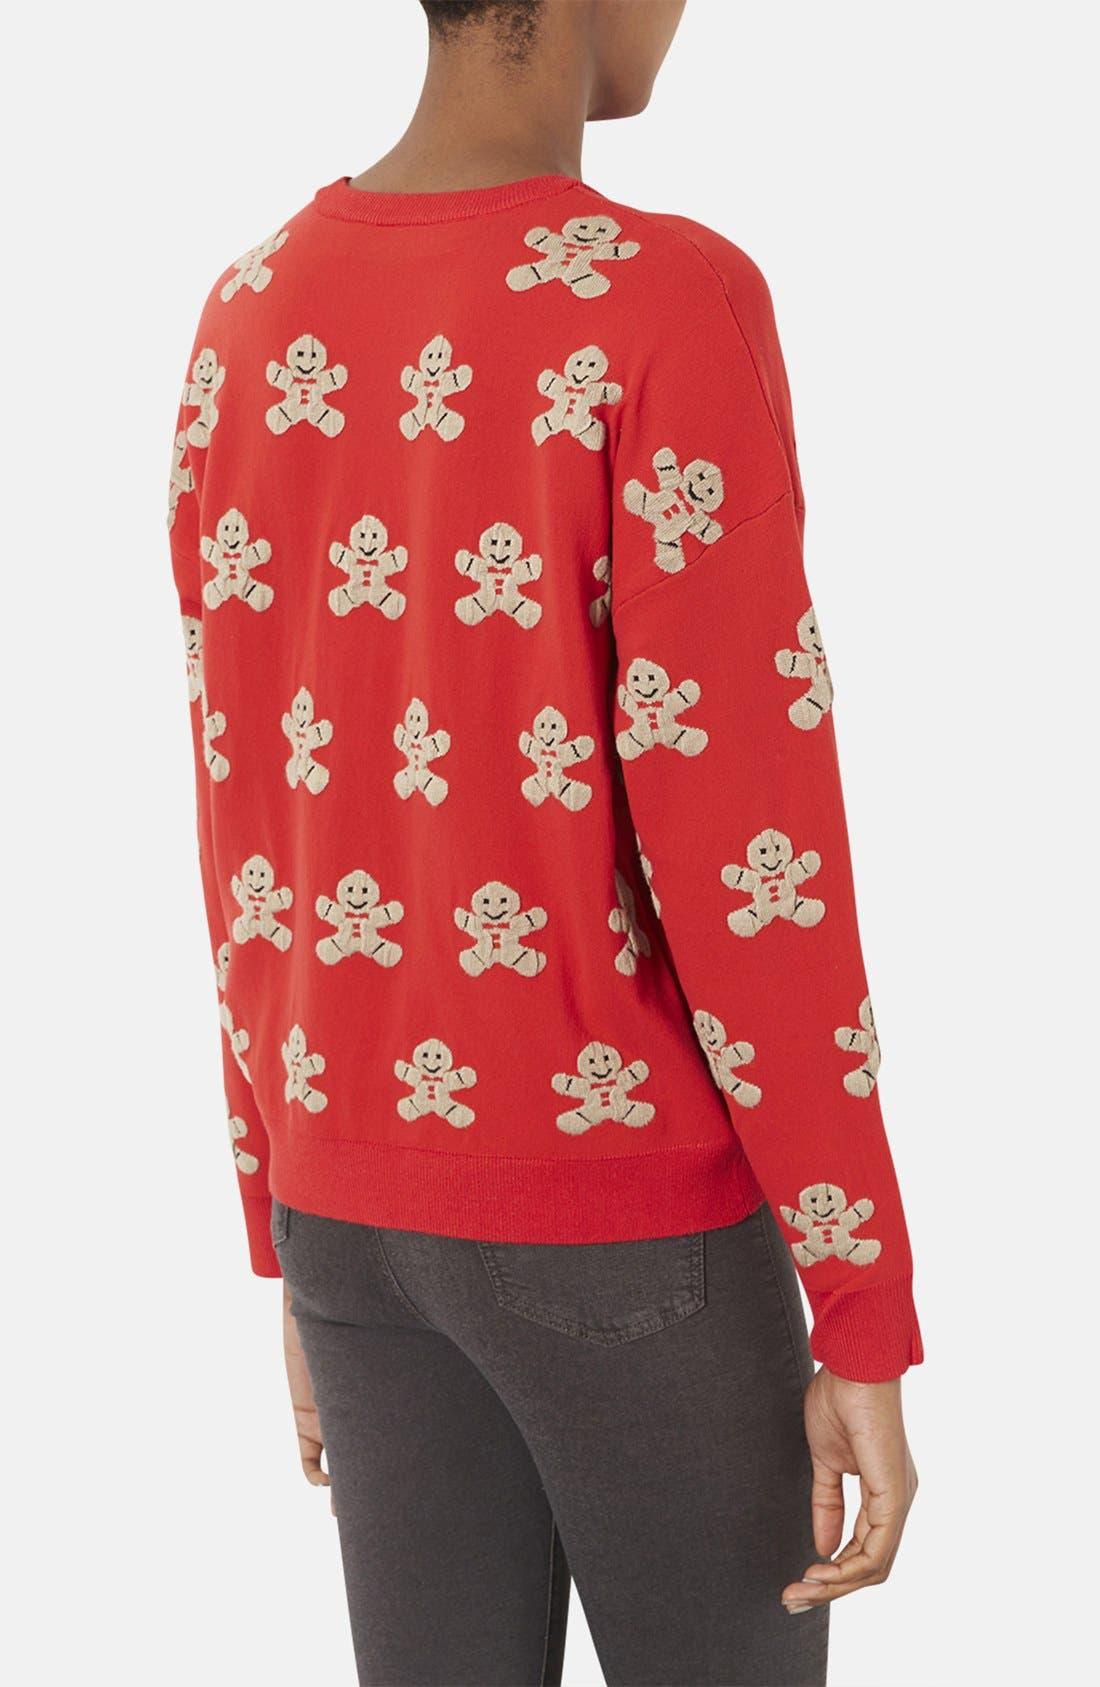 TOPSHOP,                             Gingerbread Man Sweater,                             Alternate thumbnail 2, color,                             600